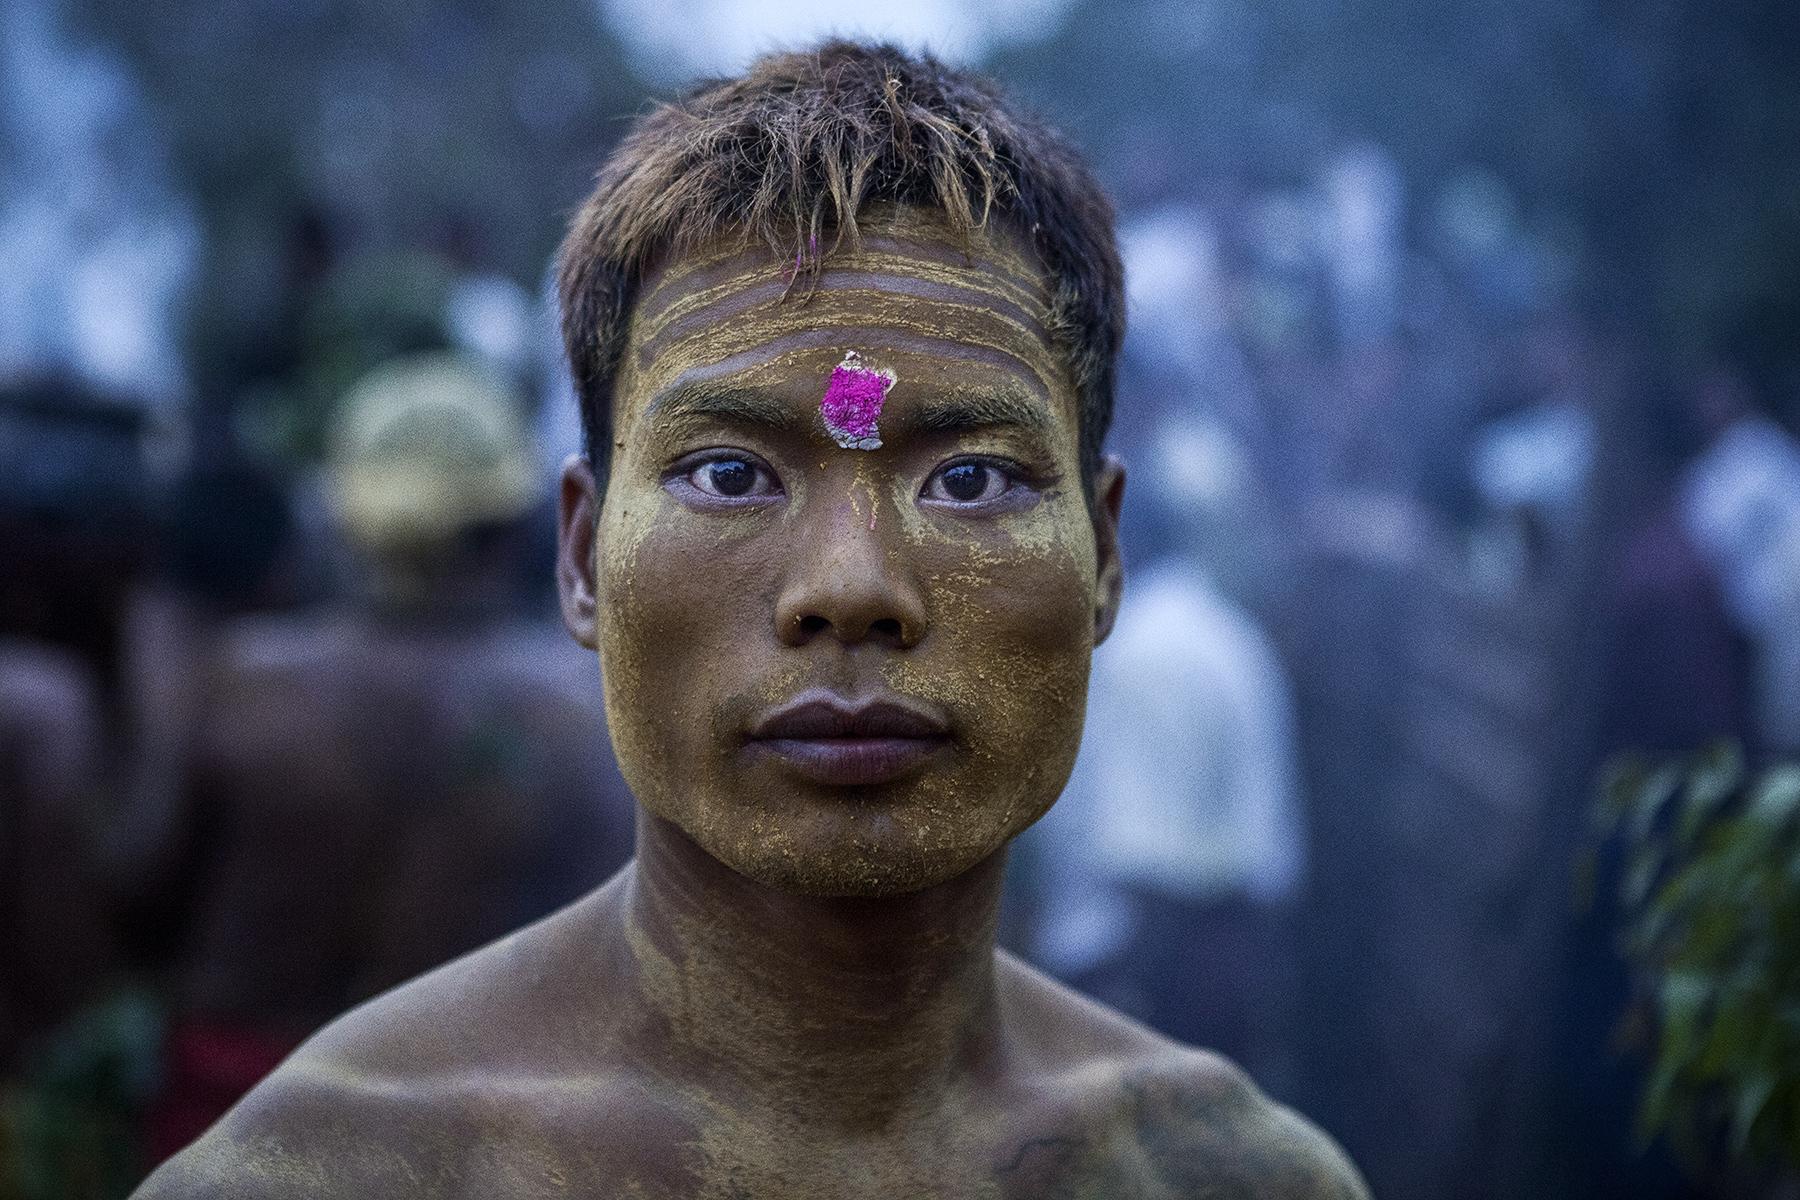 burmese_tamils_0009